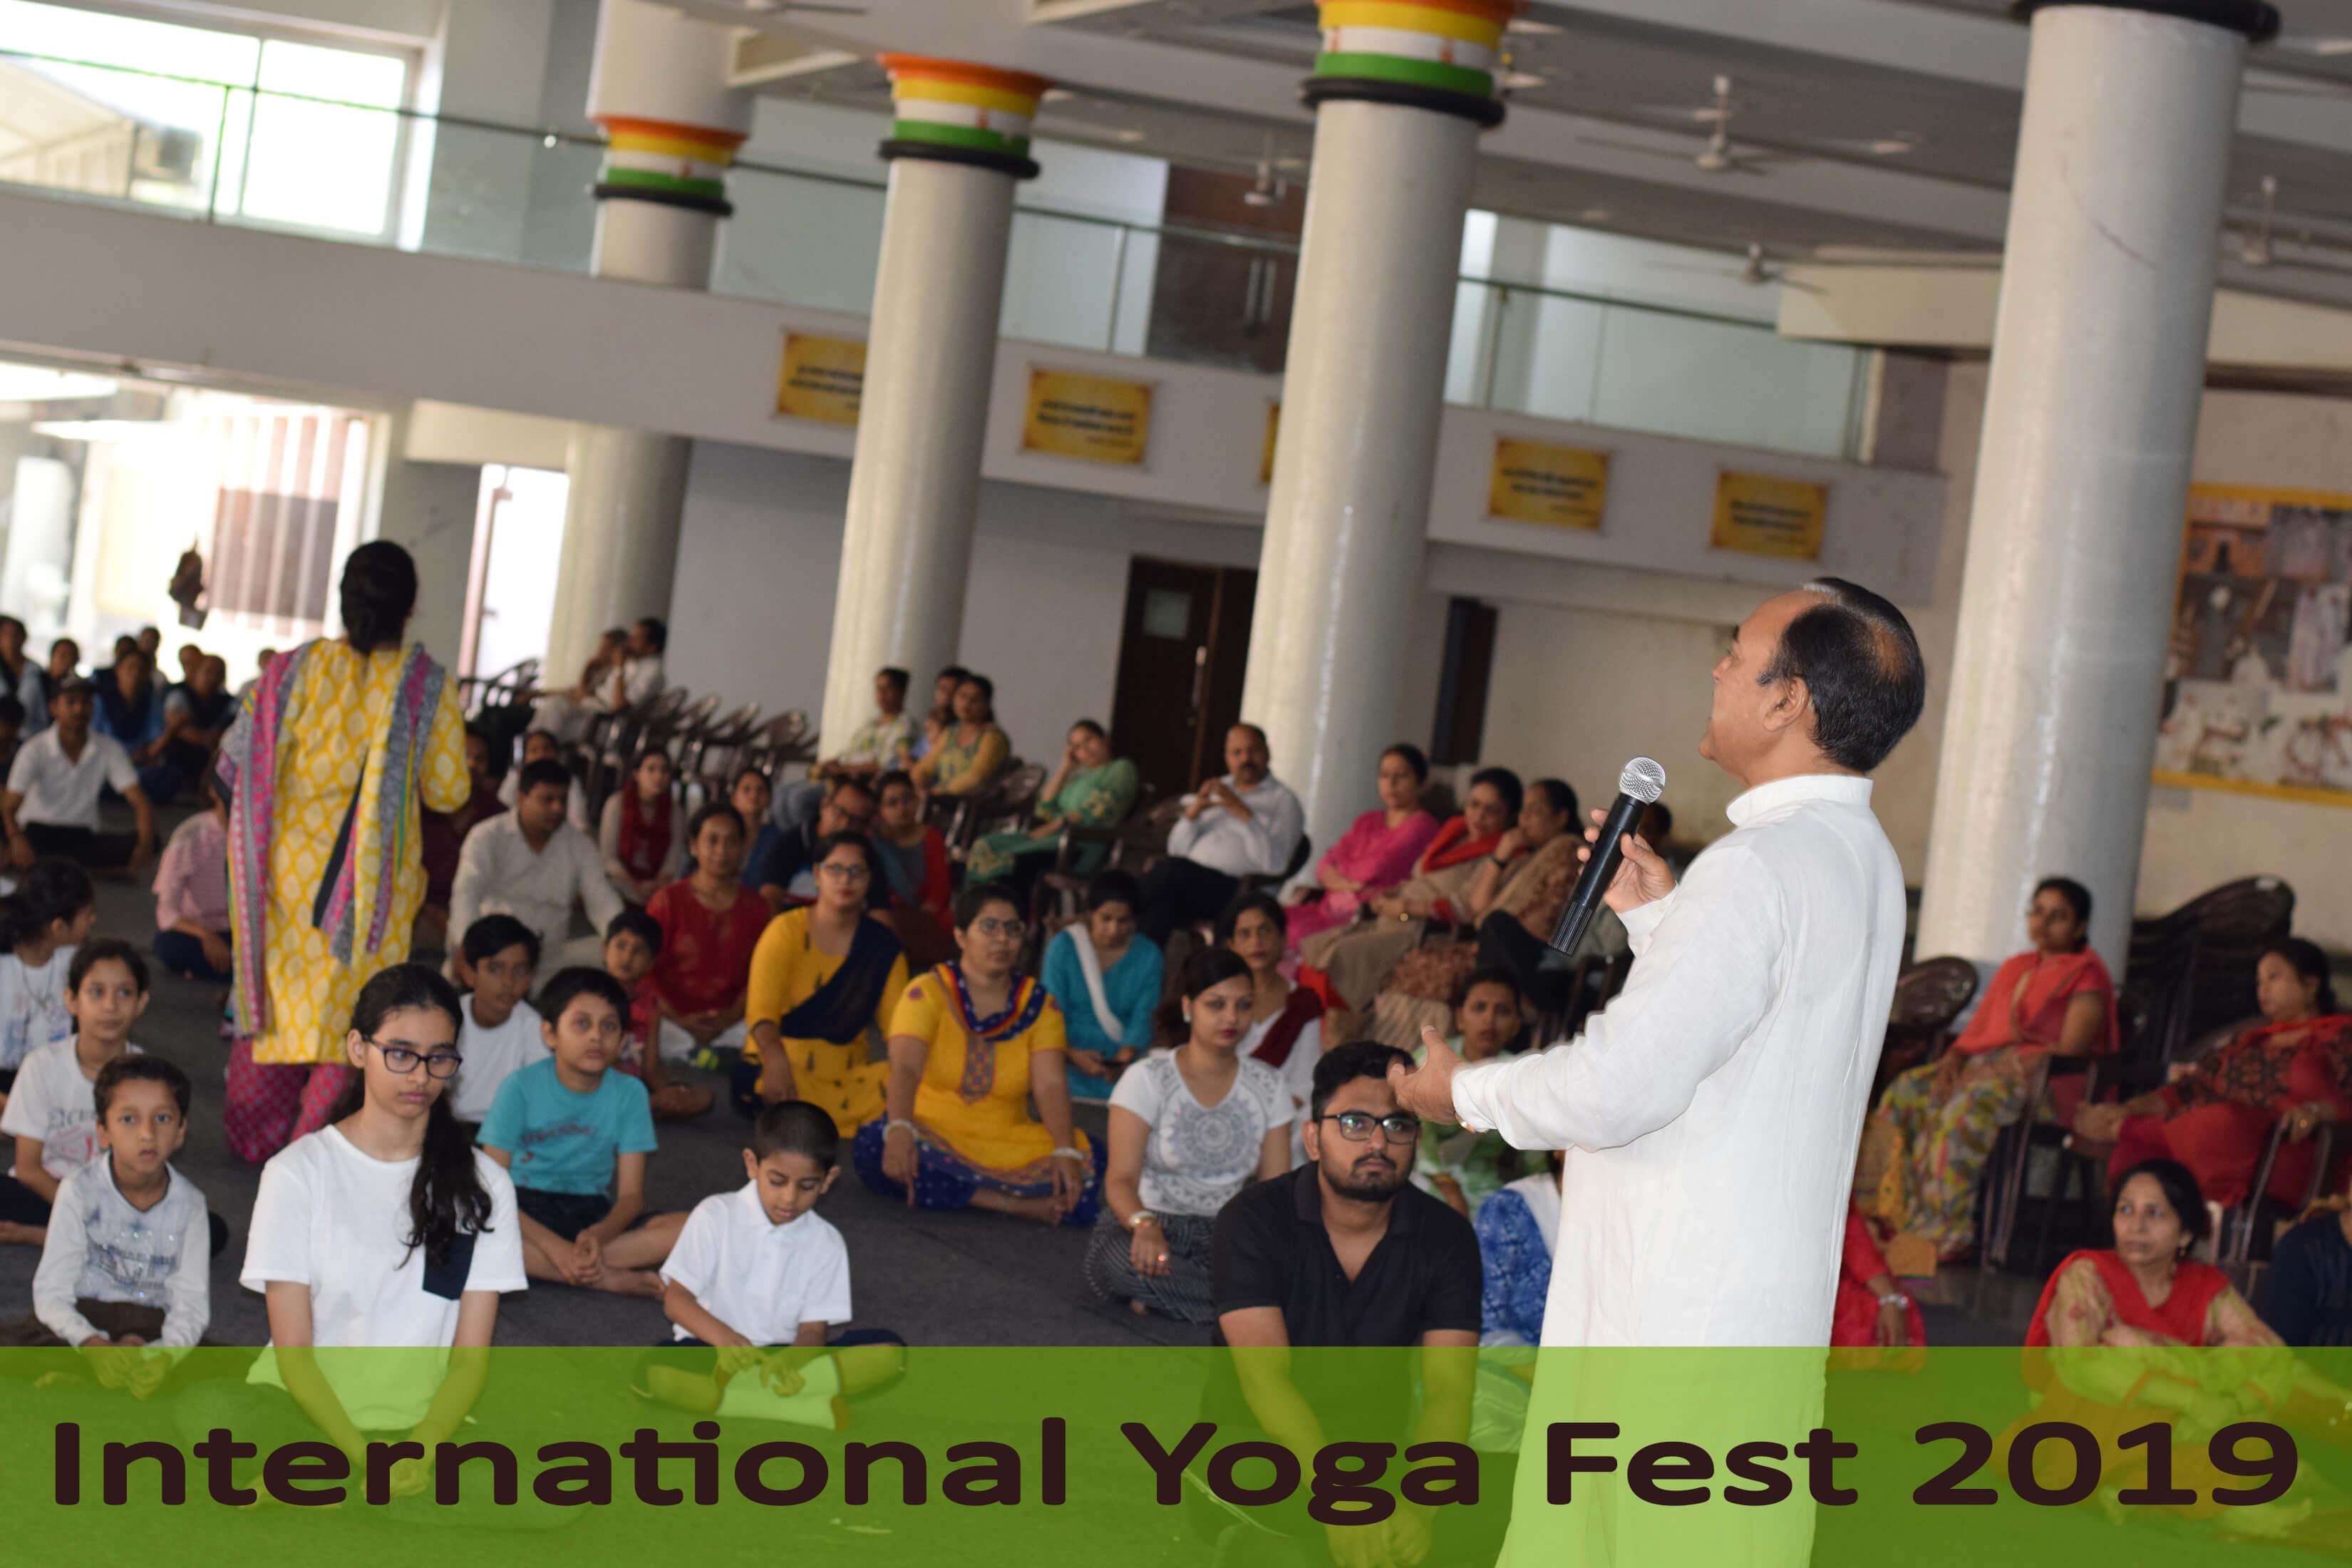 International Yoga Fest 2019